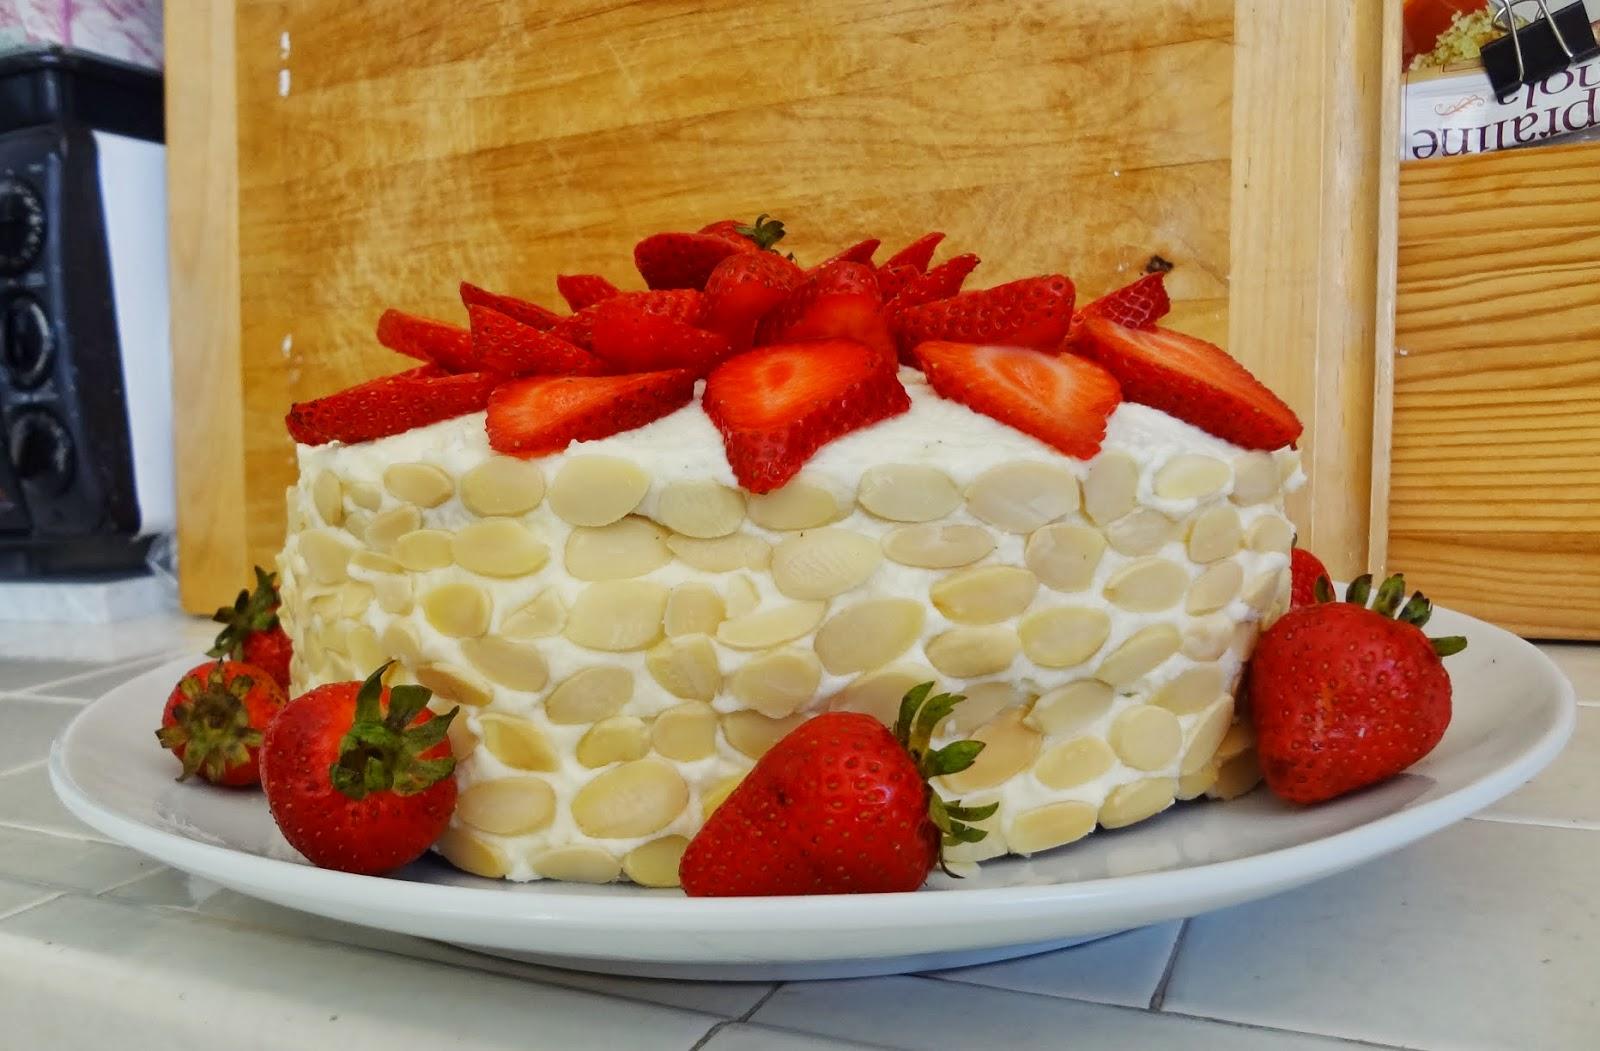 Gluten Free Strawberry Almond Cake with Mascarpone Cream